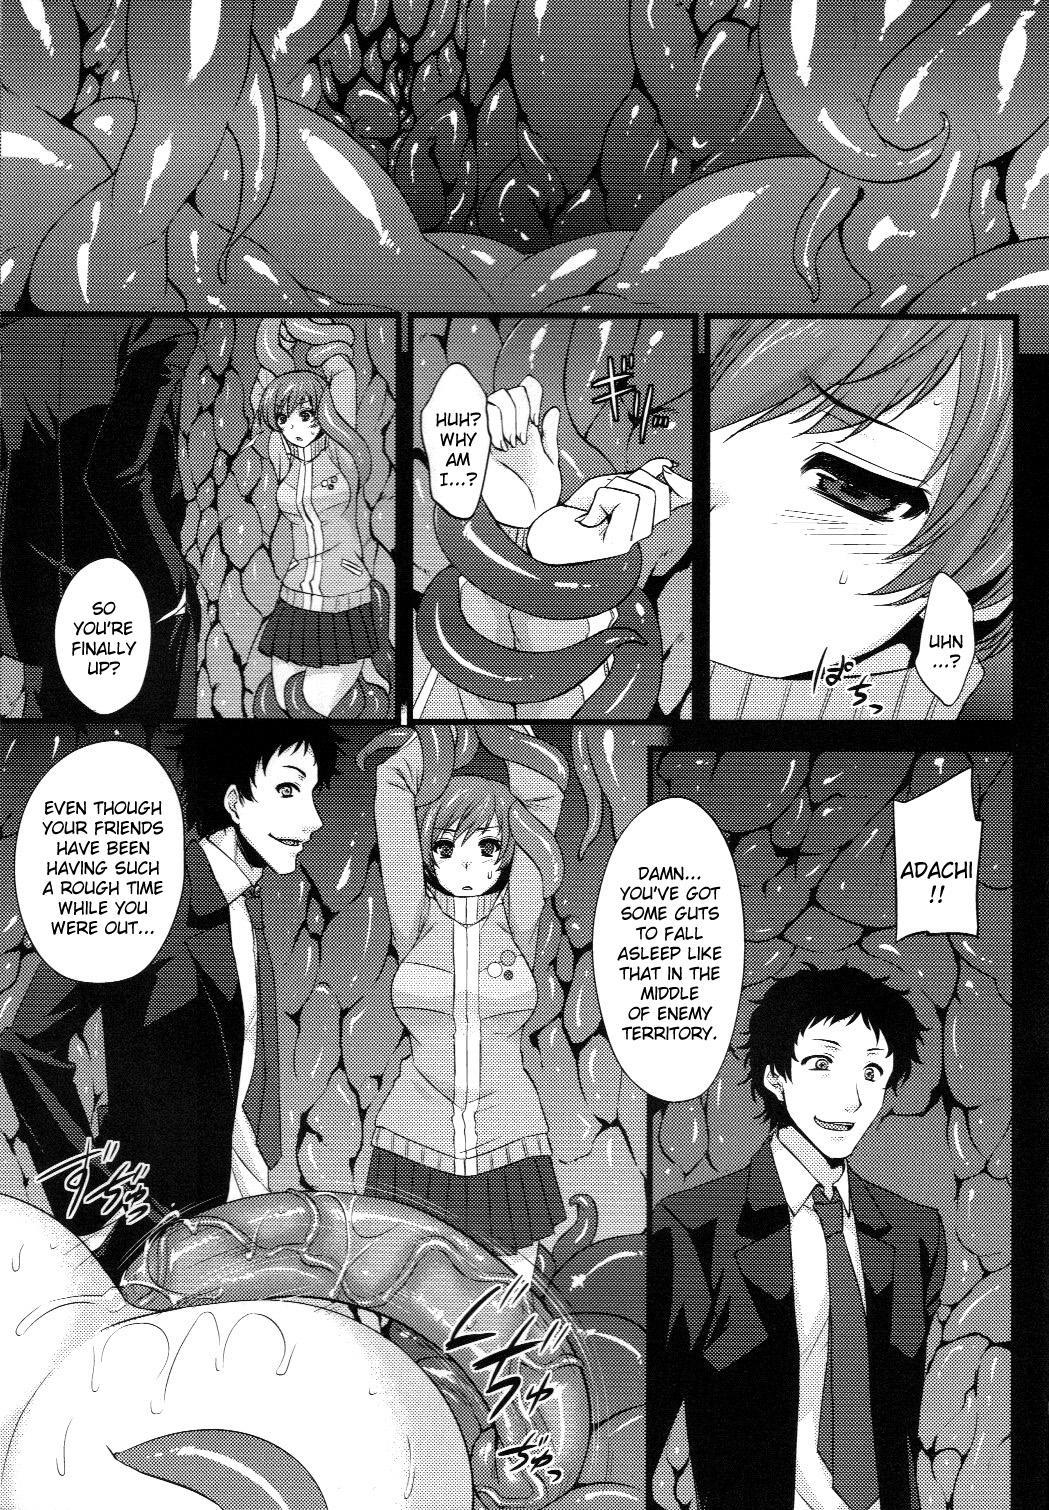 Yorunikieru | Vanishing Into The Night 1